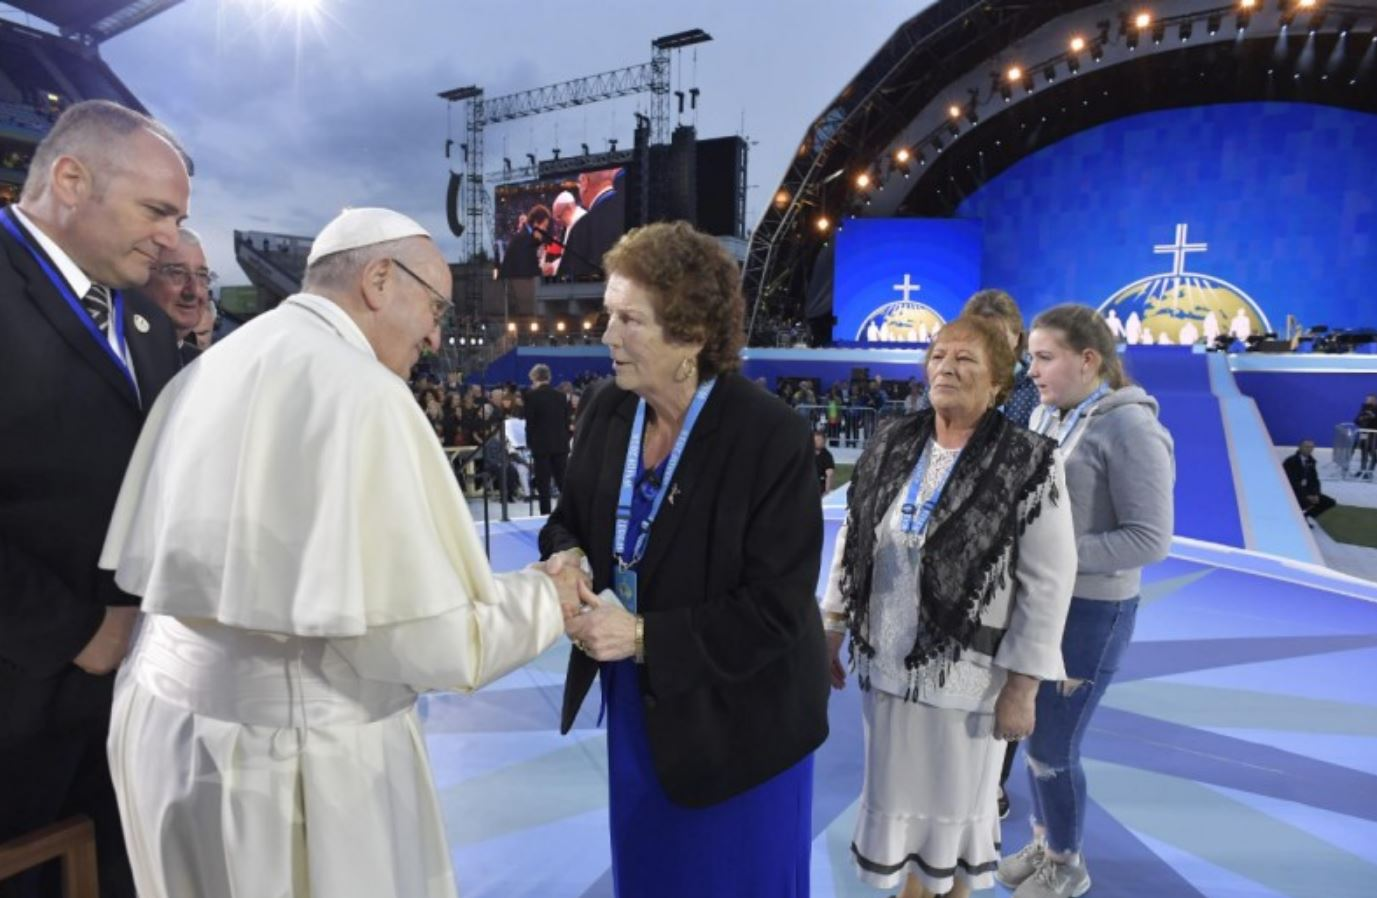 Missy Collins, Travellers, Festival des familles, Dublin, Irlande © Vatican Media